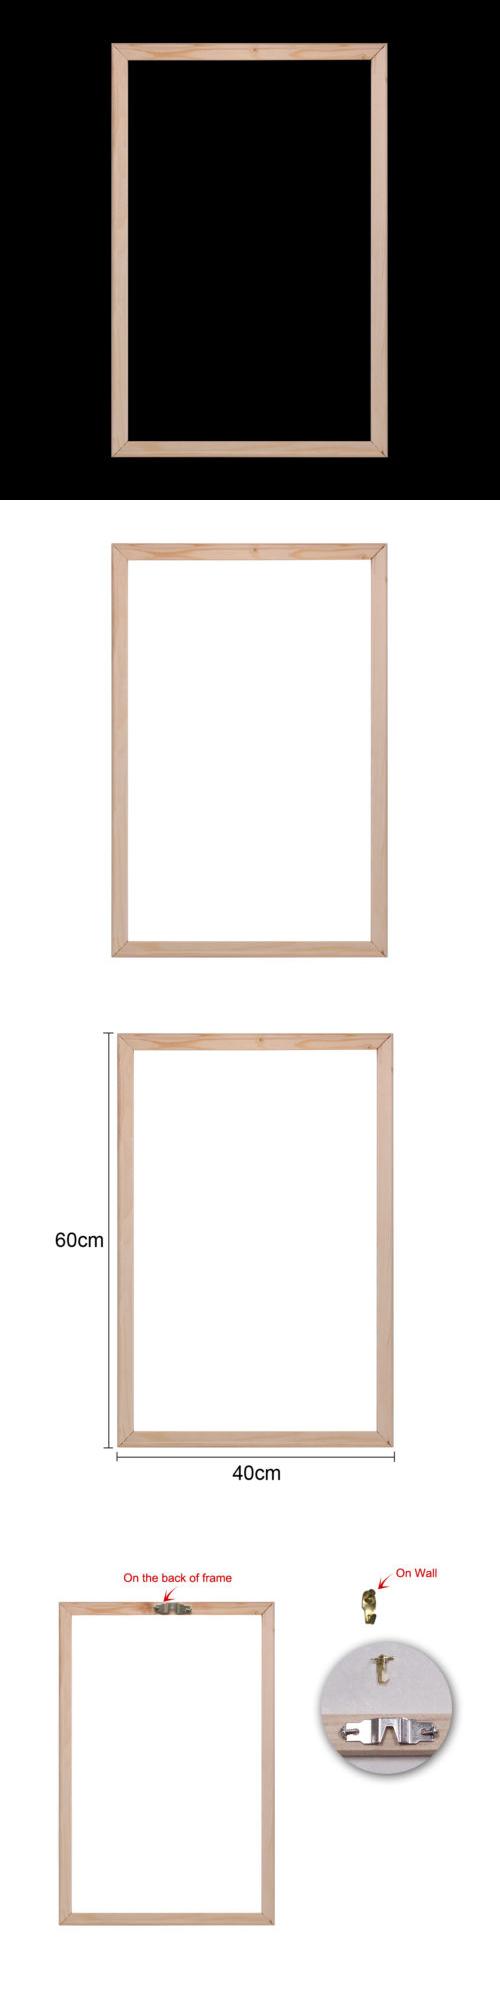 Frames and Supplies 37575: Wood Frame Art Canvas Stretcher Bars ...